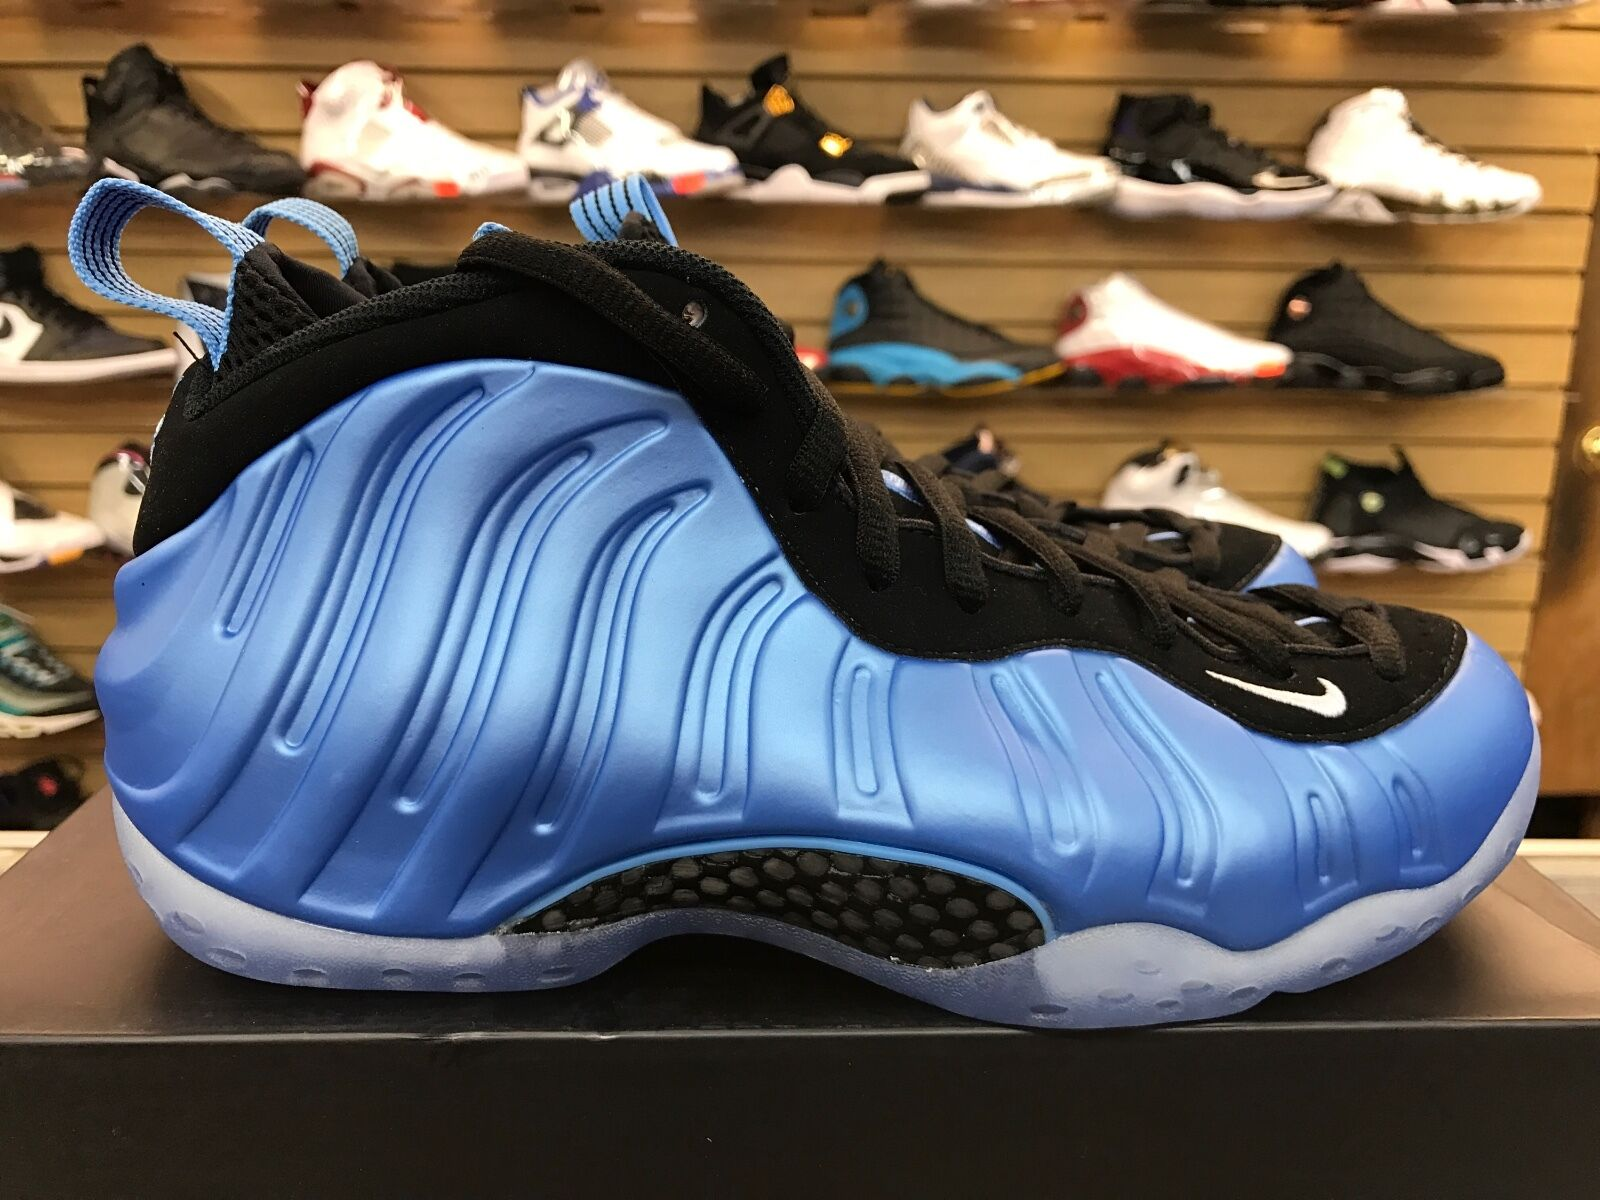 Nike Air Foamposite one 'University Azul' Zapatos UNC 314996-402 Hombre Raros Zapatos Azul' casuales 100% autentico salvaje 06efcd